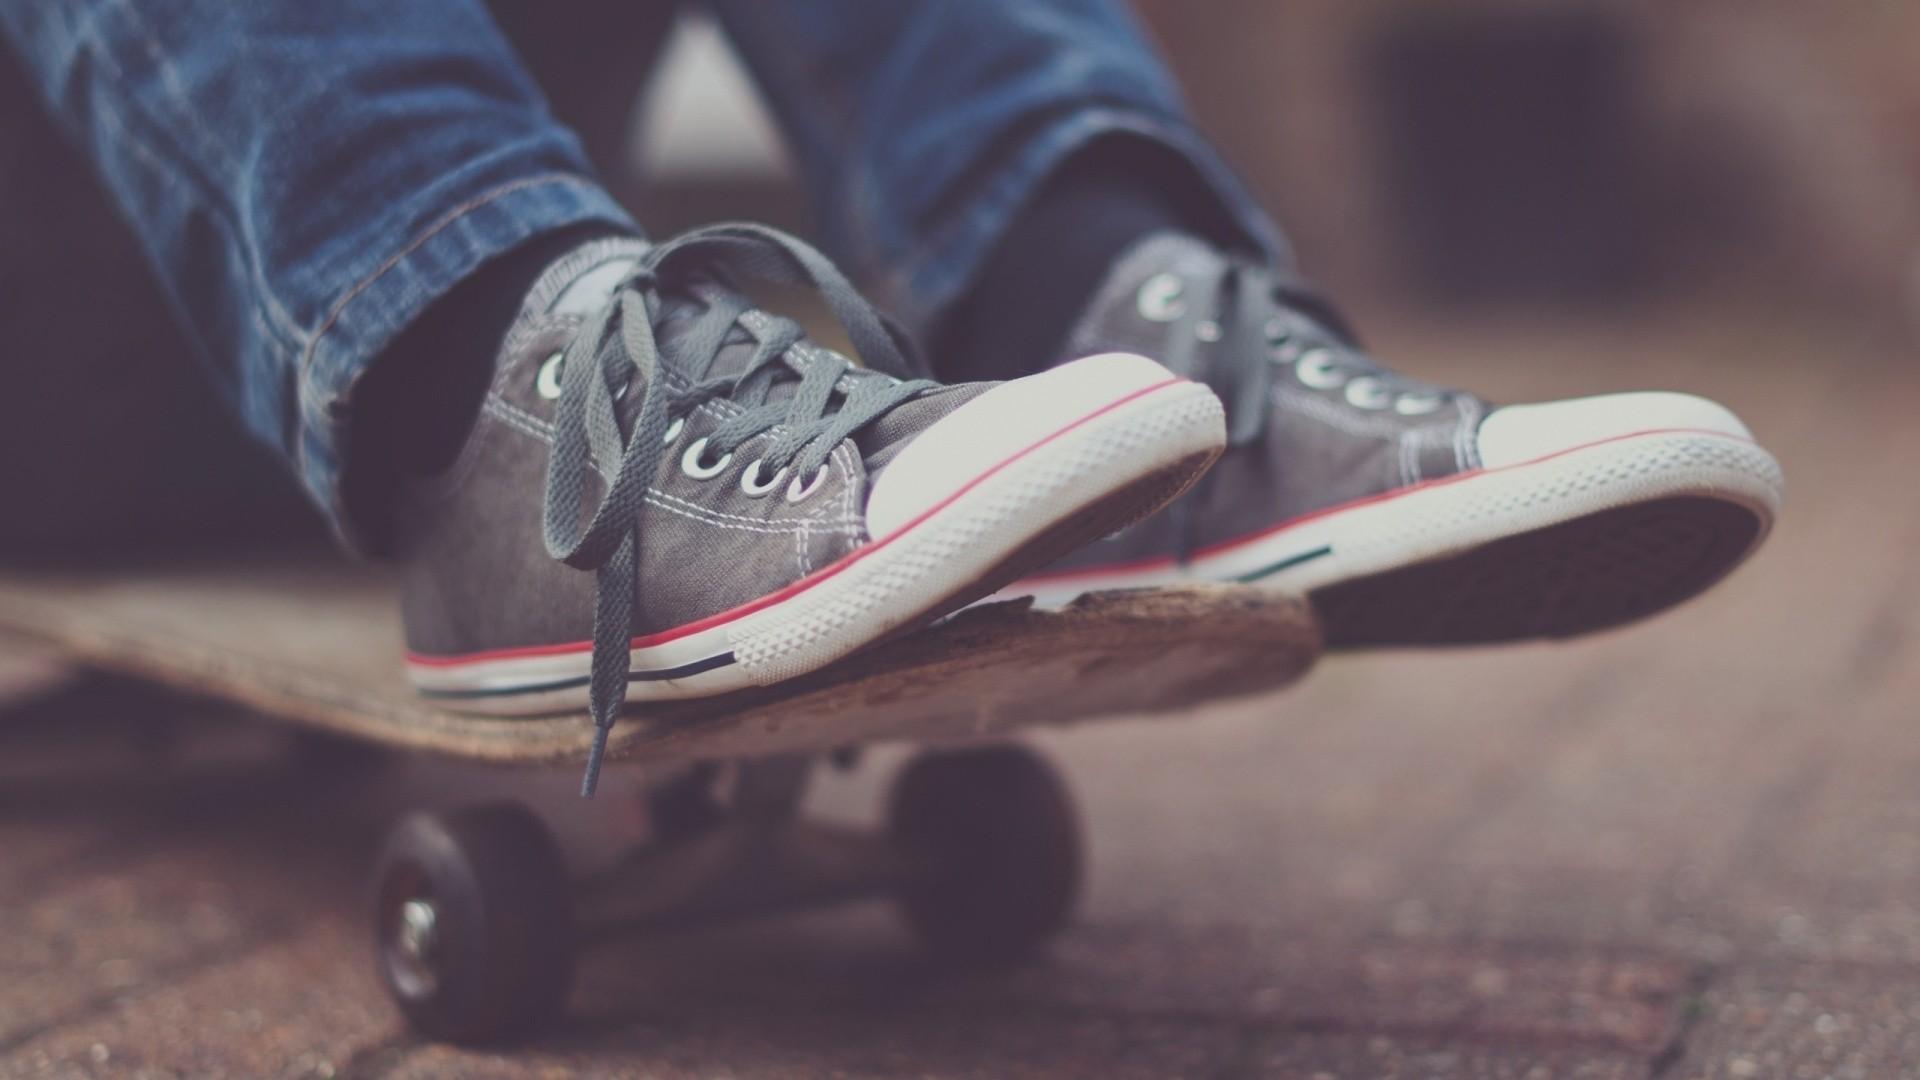 Skateboard wallpaper photo hd